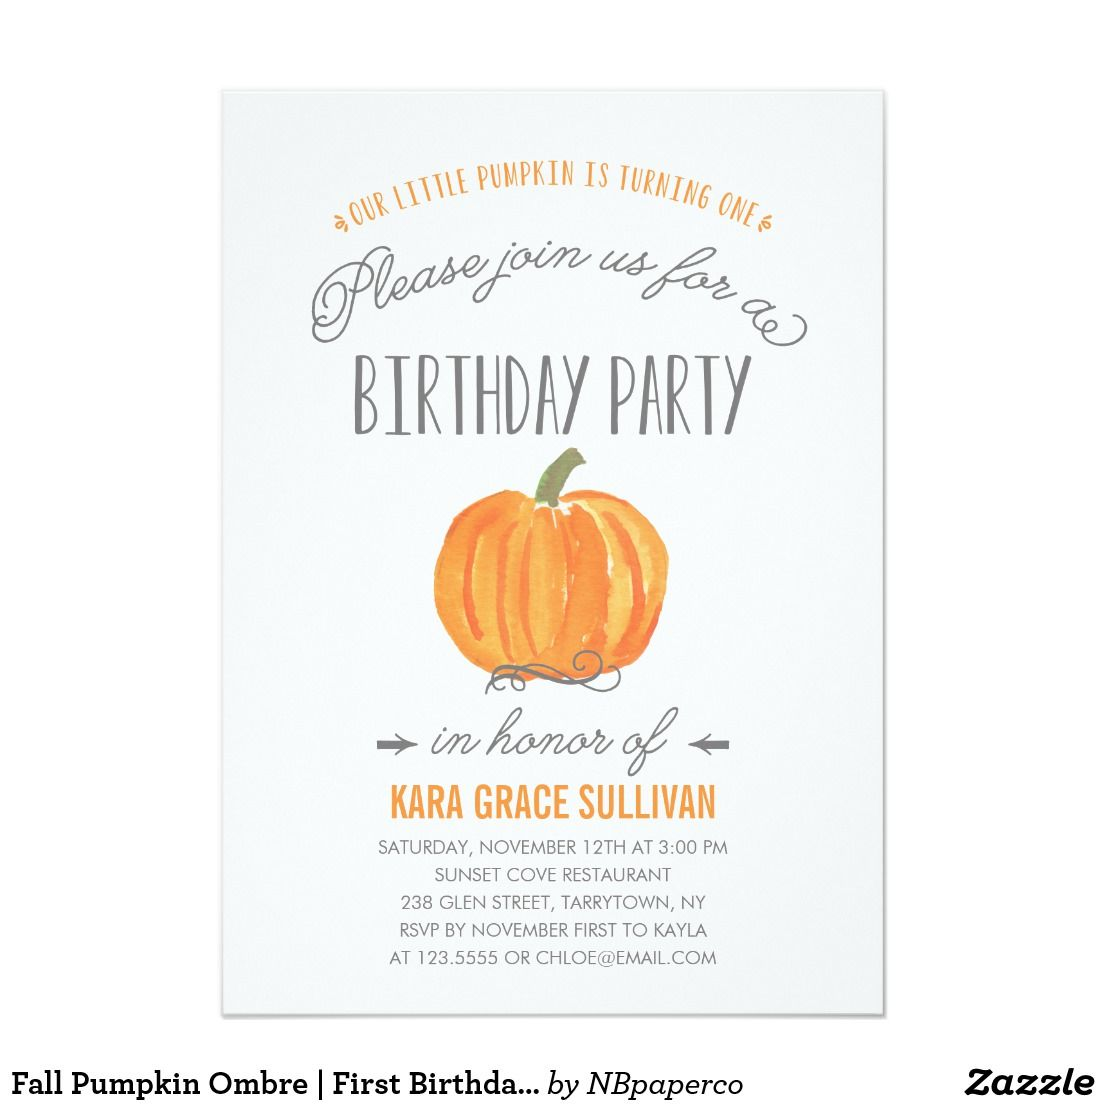 Fall Pumpkin Ombre | First Birthday Invitation